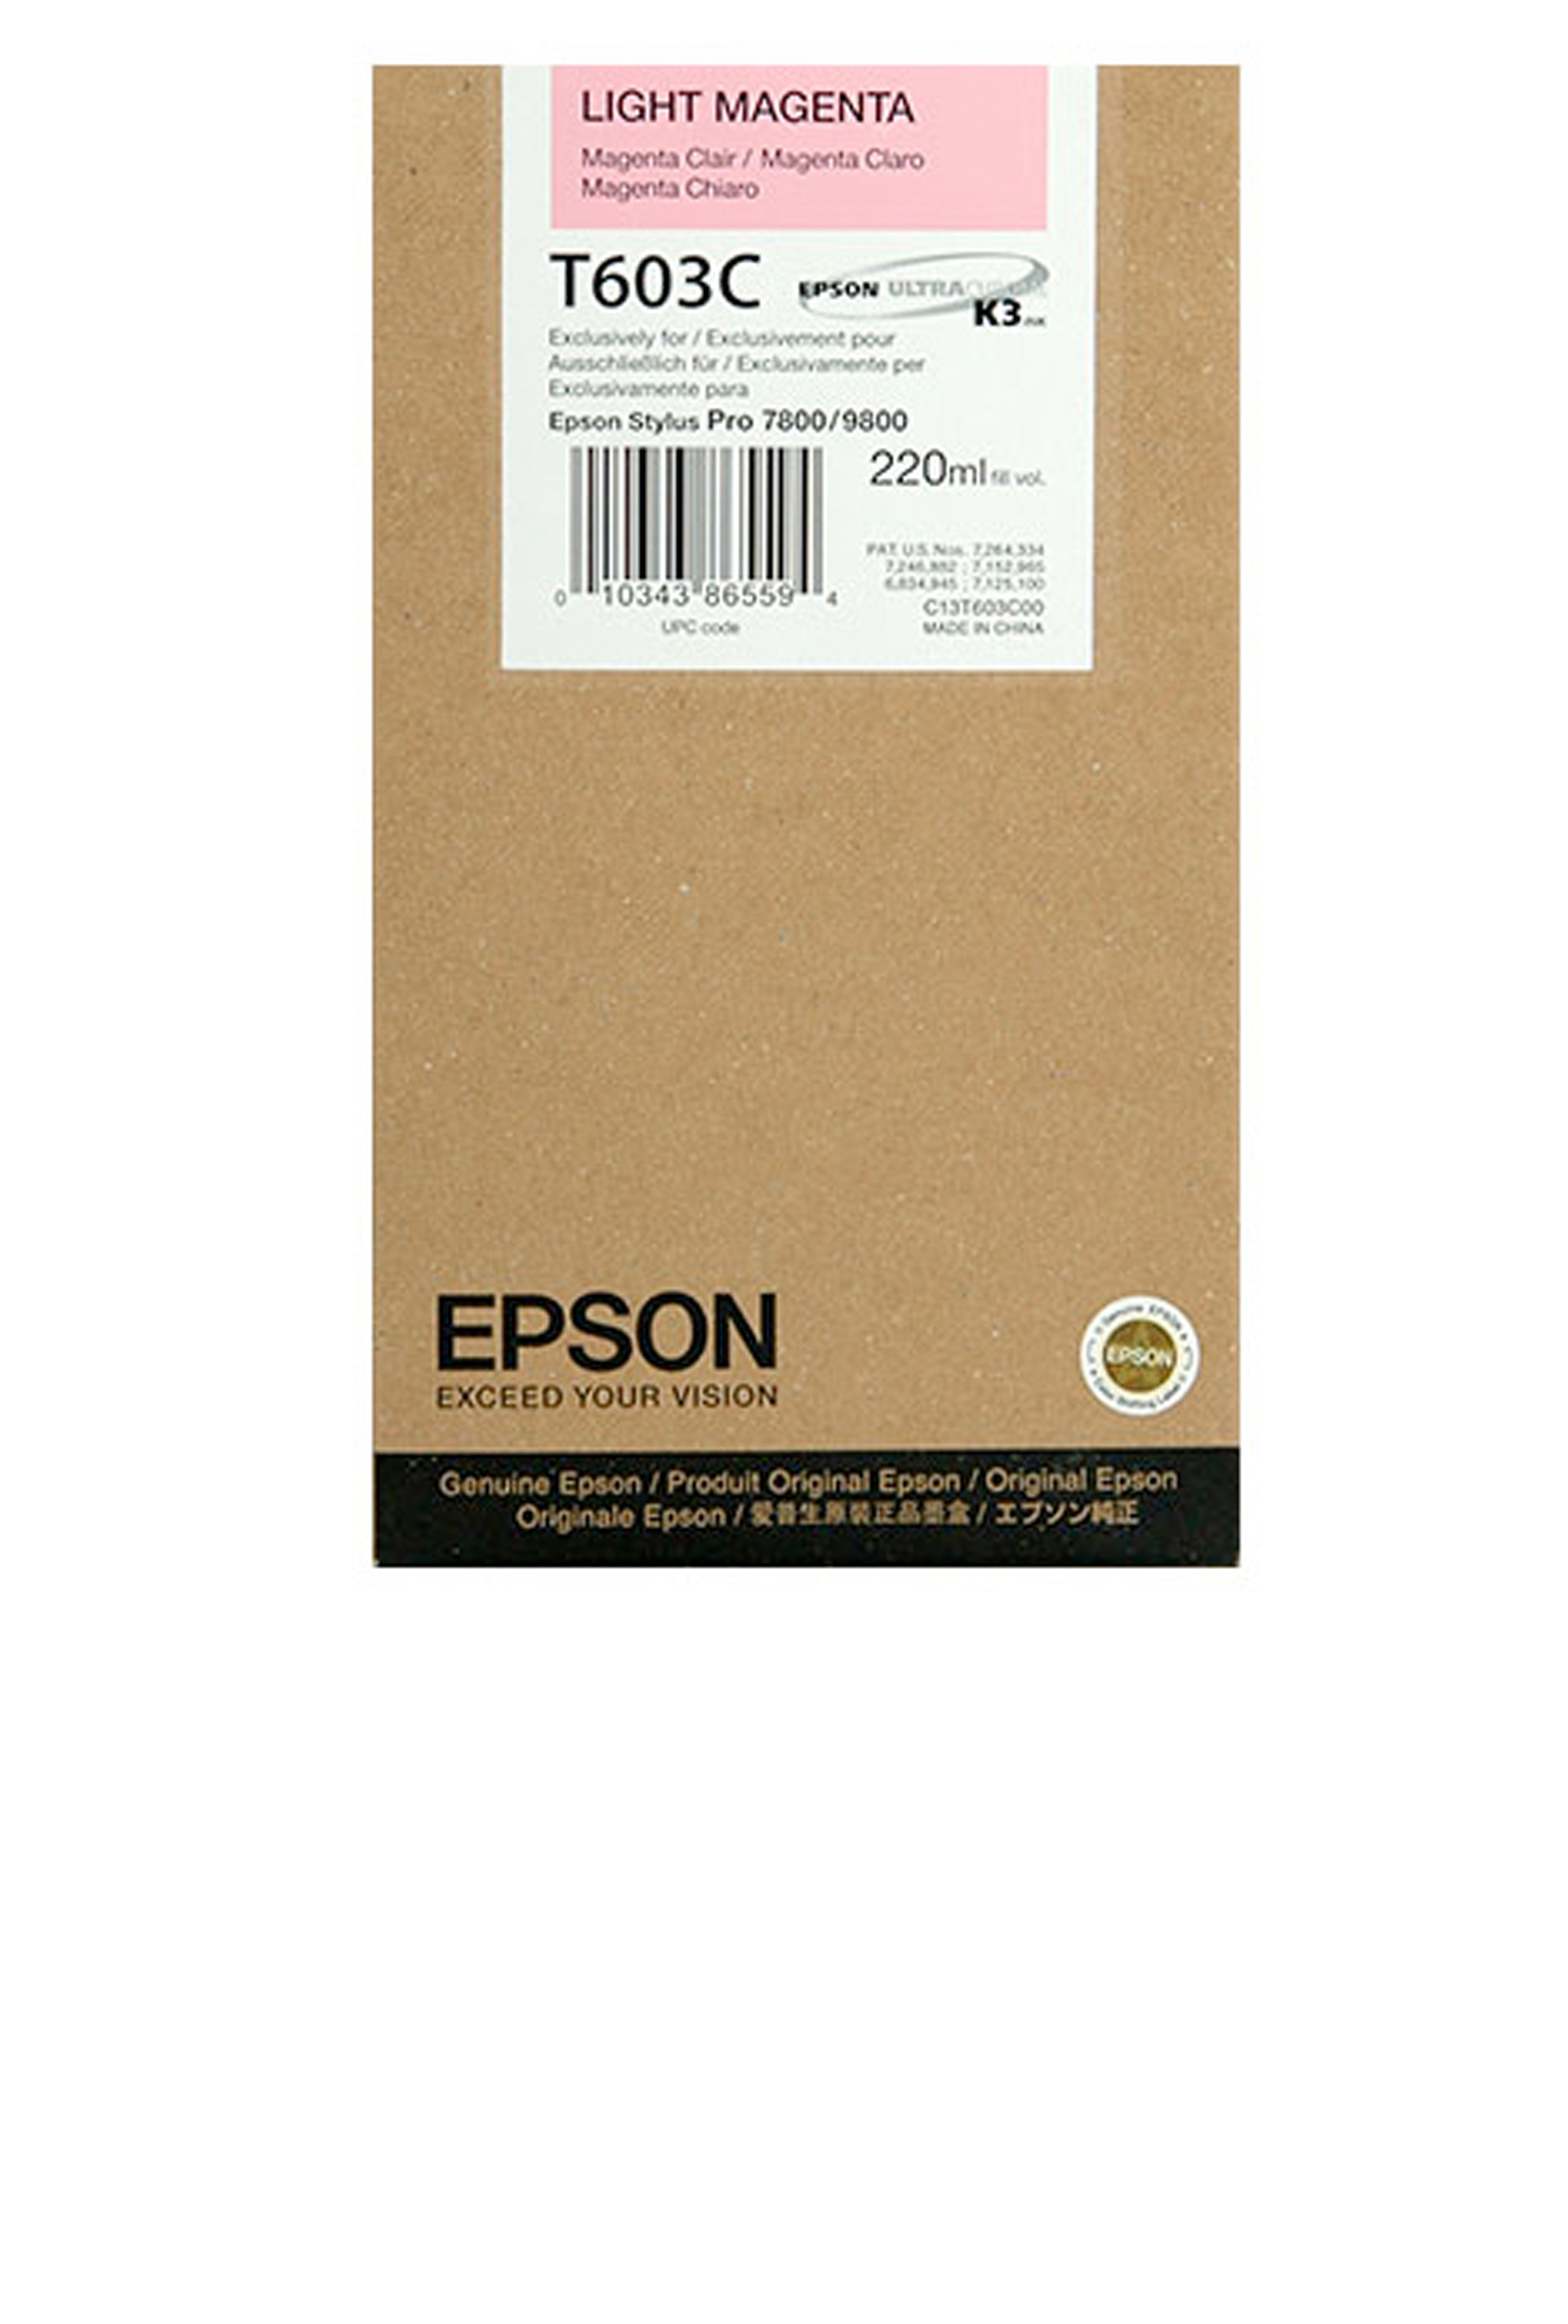 Epson EPSON SD LT MAGENTA INK (220 ML) (T603C00)